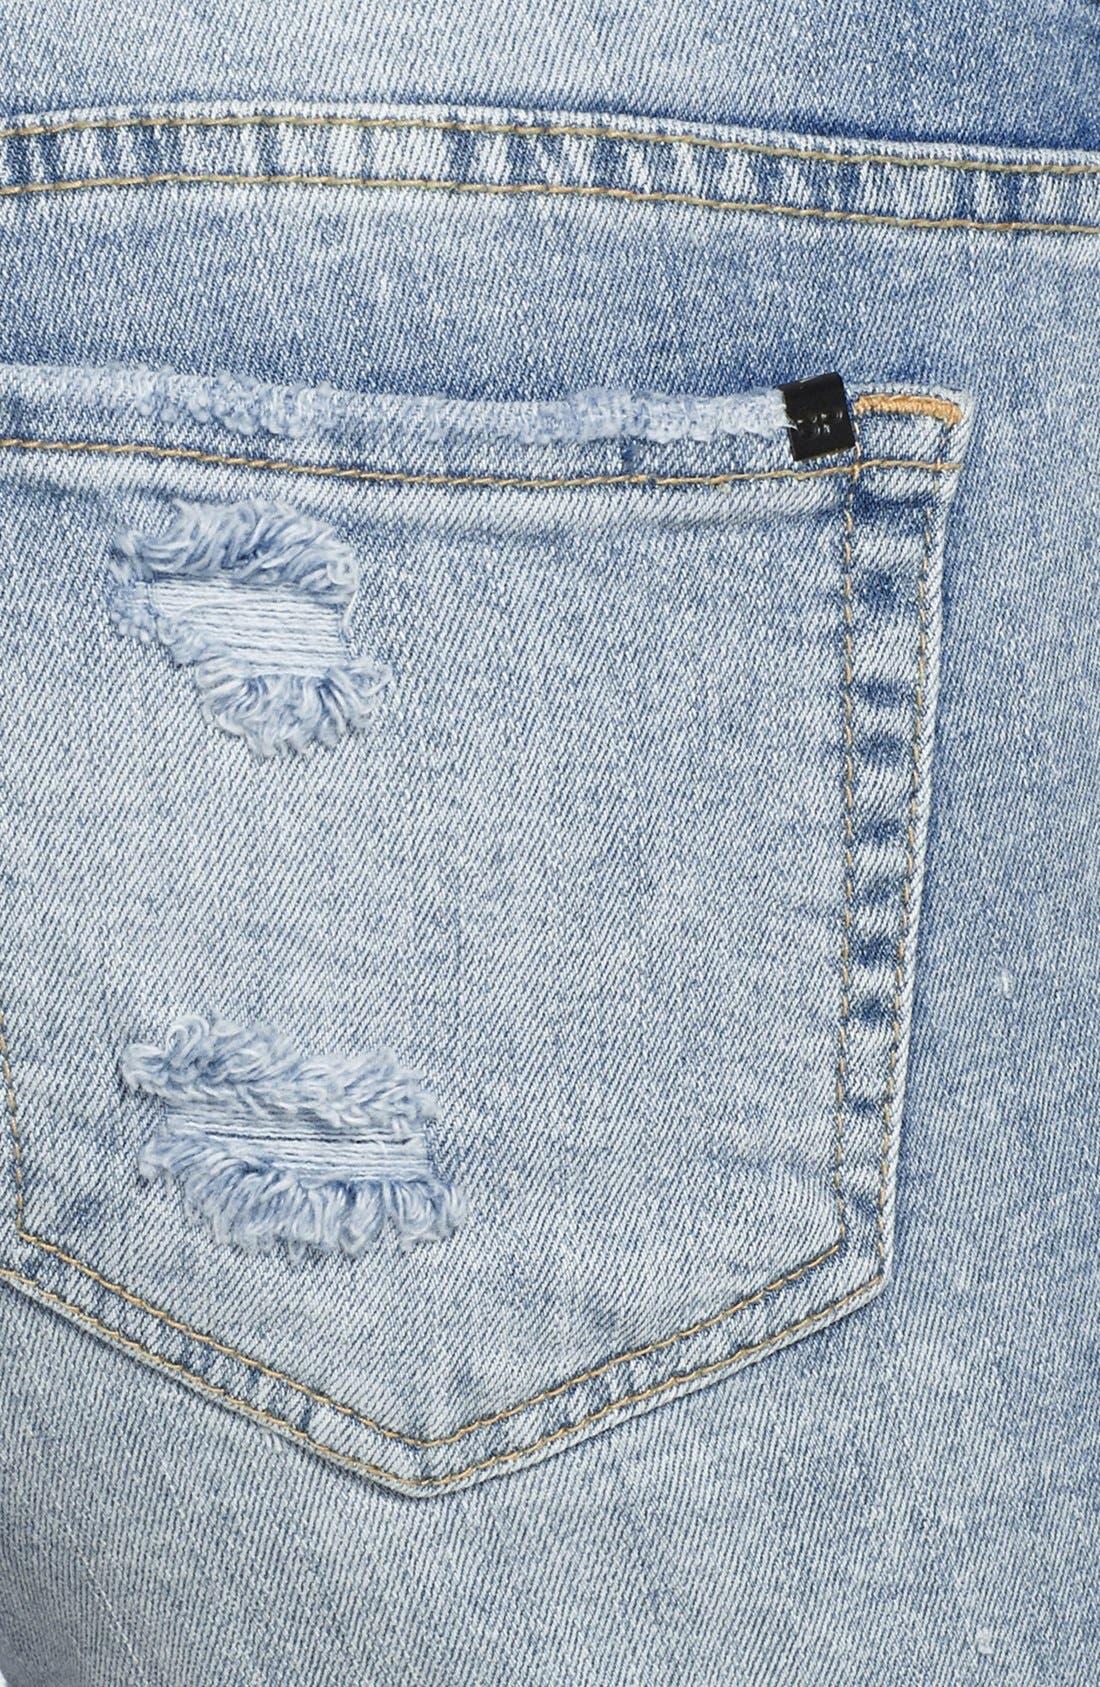 Distressed Roll Cuff Denim Shorts,                             Alternate thumbnail 3, color,                             Light Blue